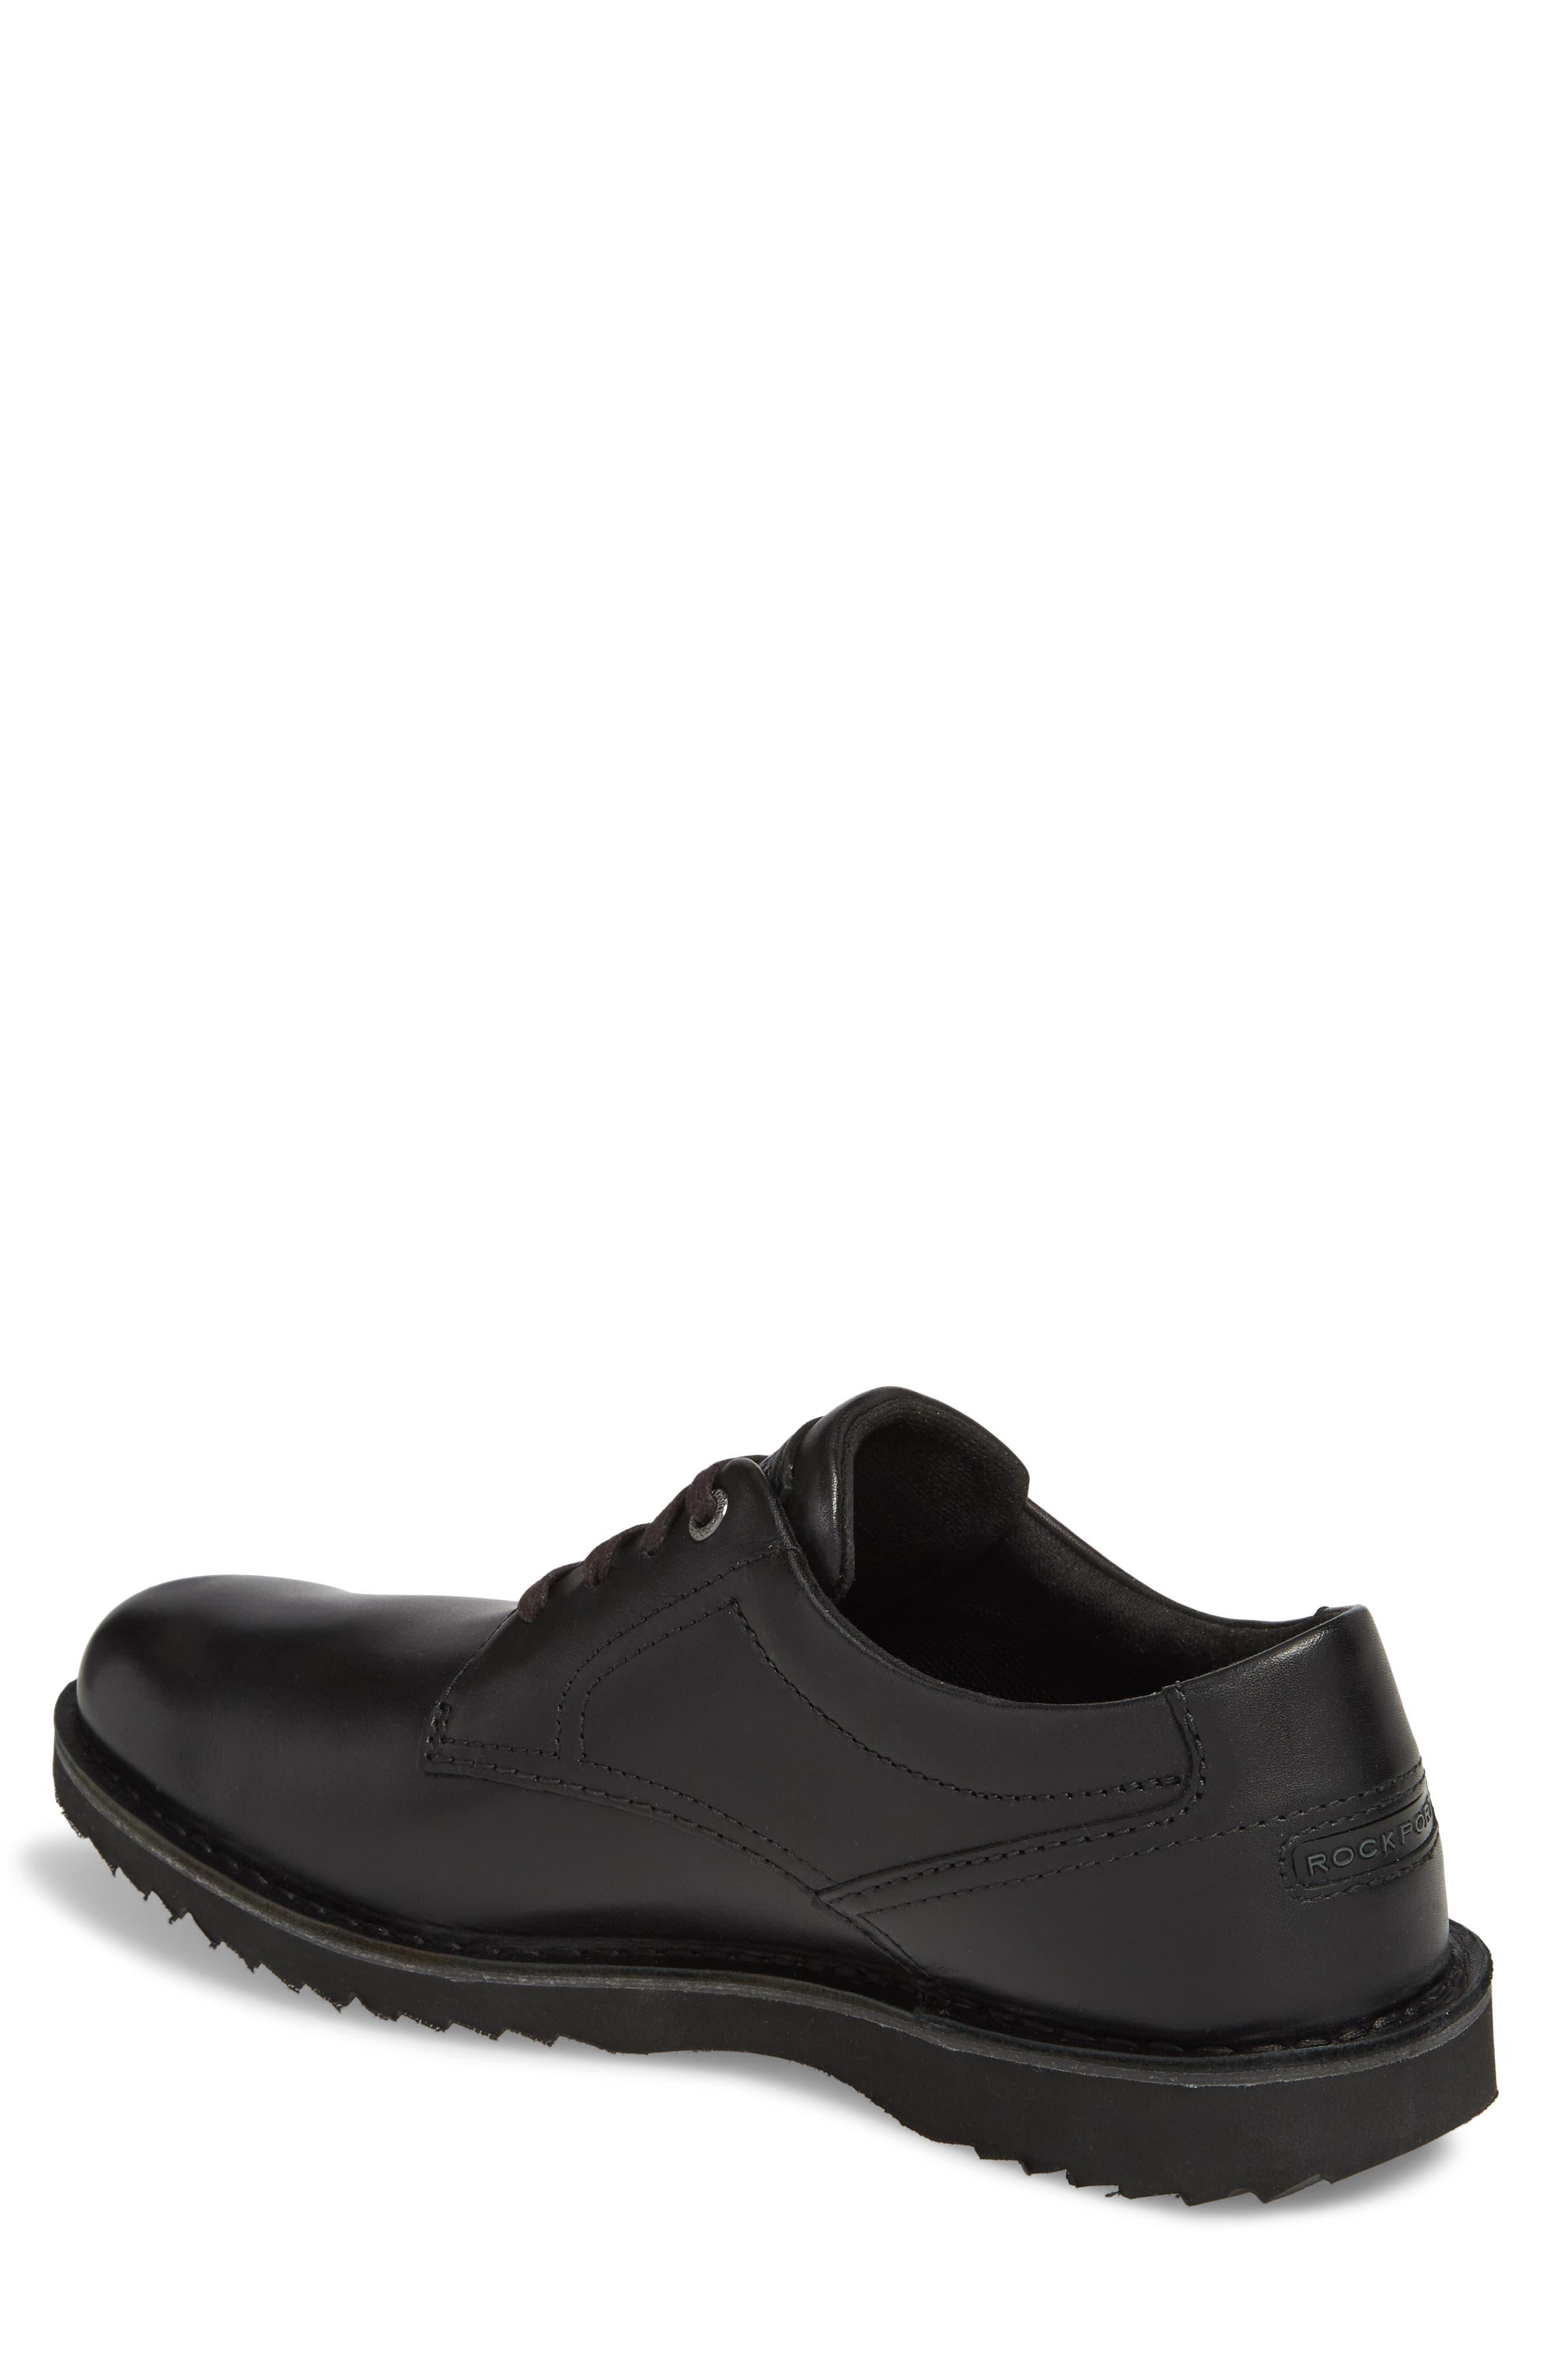 Cabot Plain Toe Derby,                             Alternate thumbnail 2, color,                             Black Leather